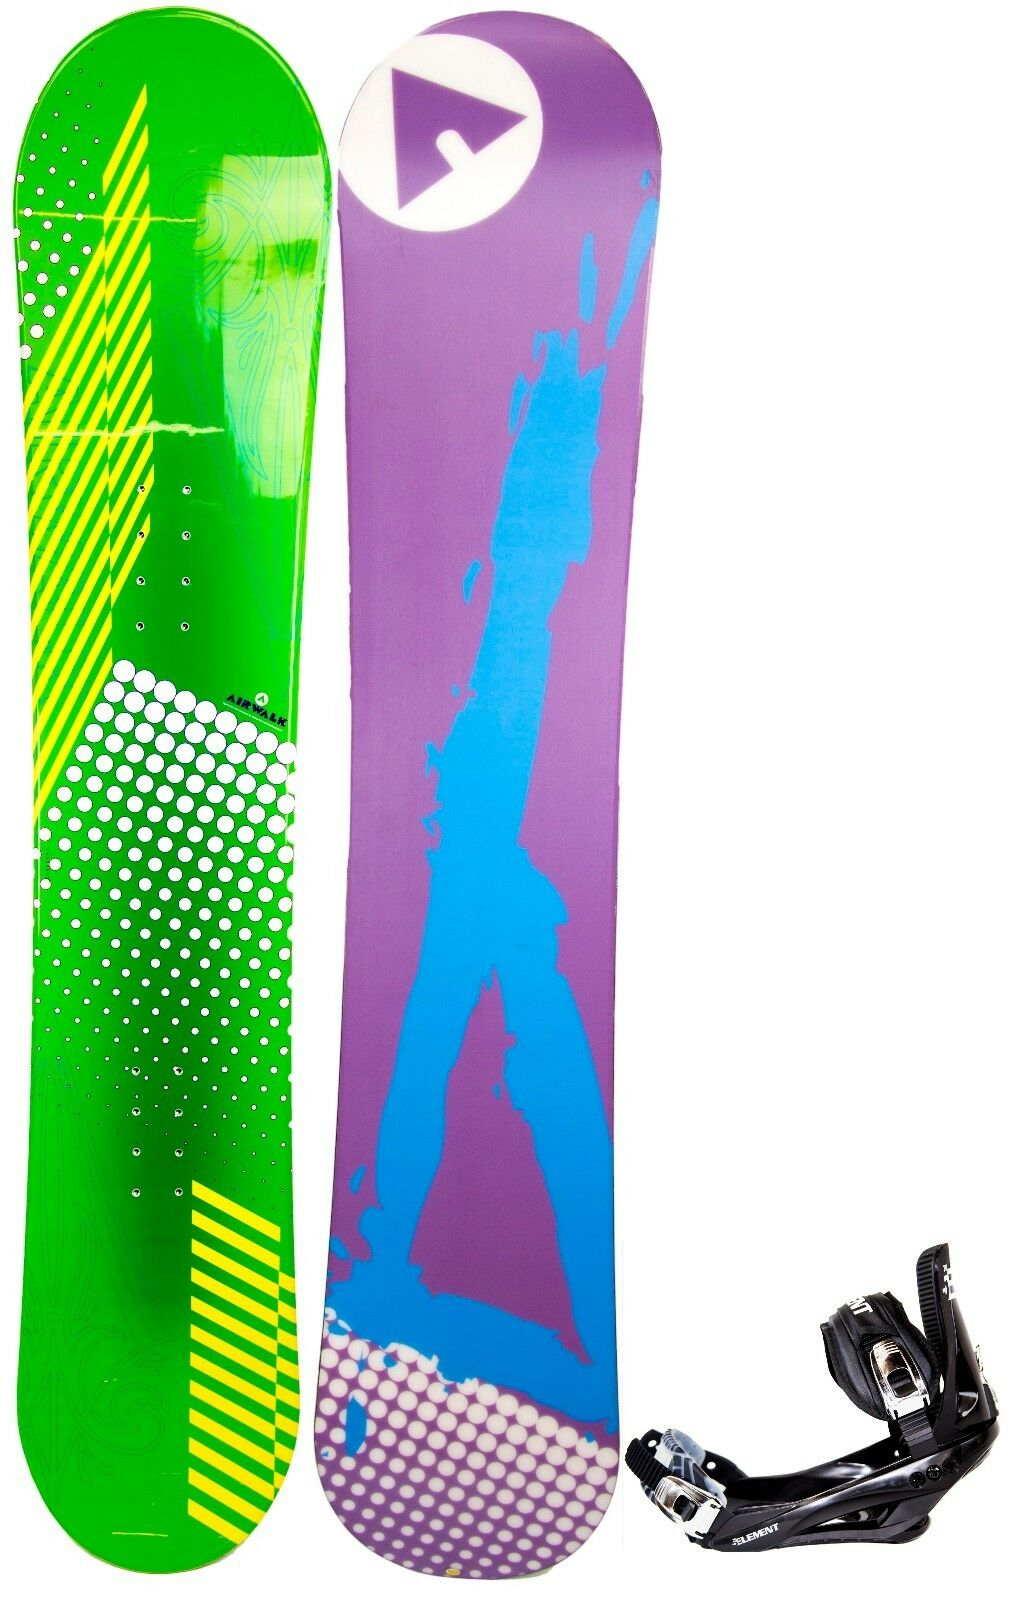 NEW   600 Mens Airwalk RARE Green Dots Snowboard +Stealth Binding 145CM Nice Ride  2018 store